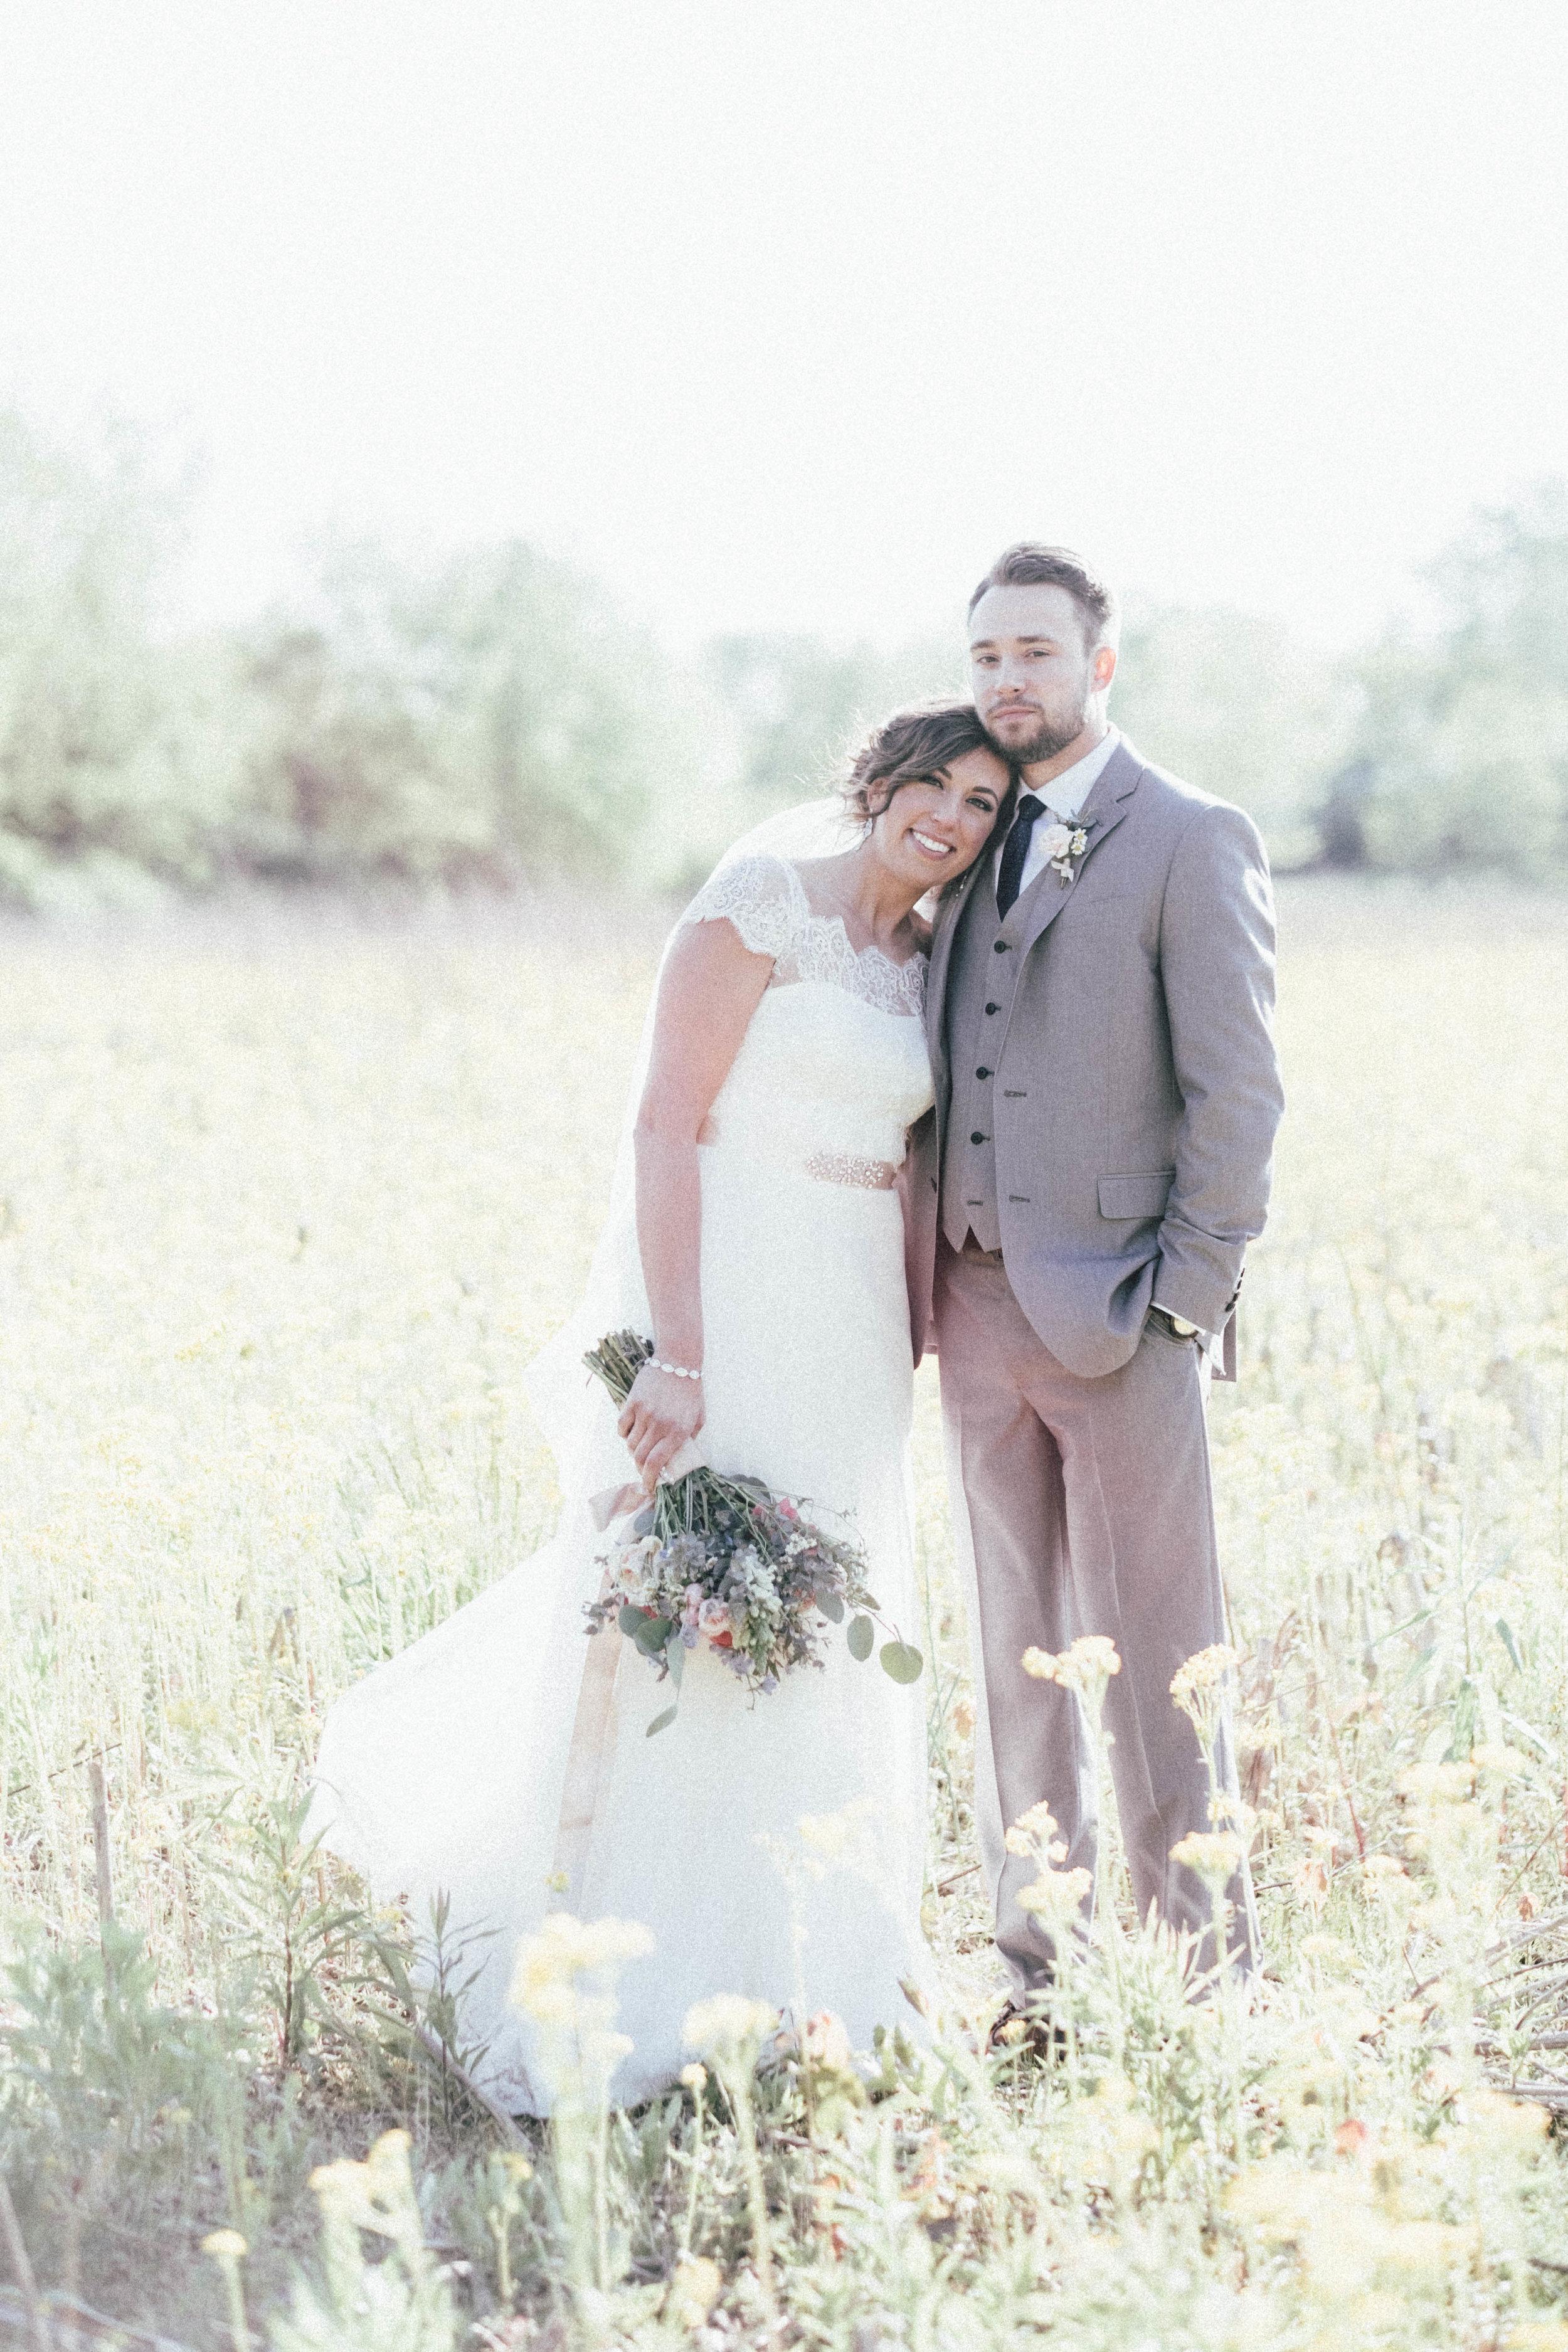 Steph-Ben-Blog-Indianapolis-Wedding-51.jpg